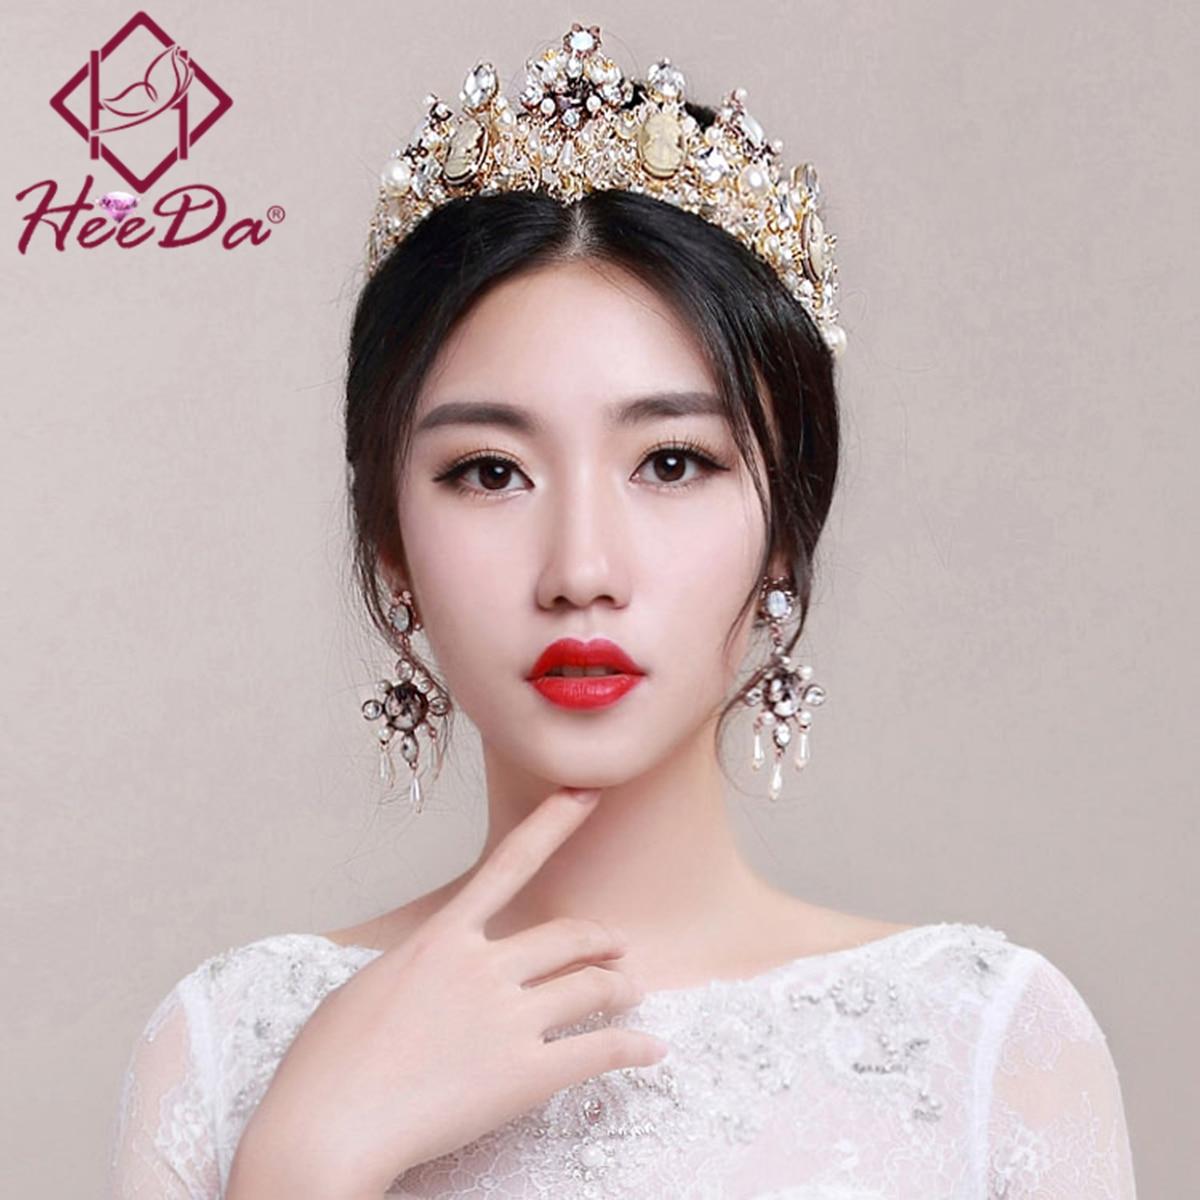 Earrings Set Wedding-Jewelry-Set Crown Bride Elegant And Sweet Hair-Decorations Romantic